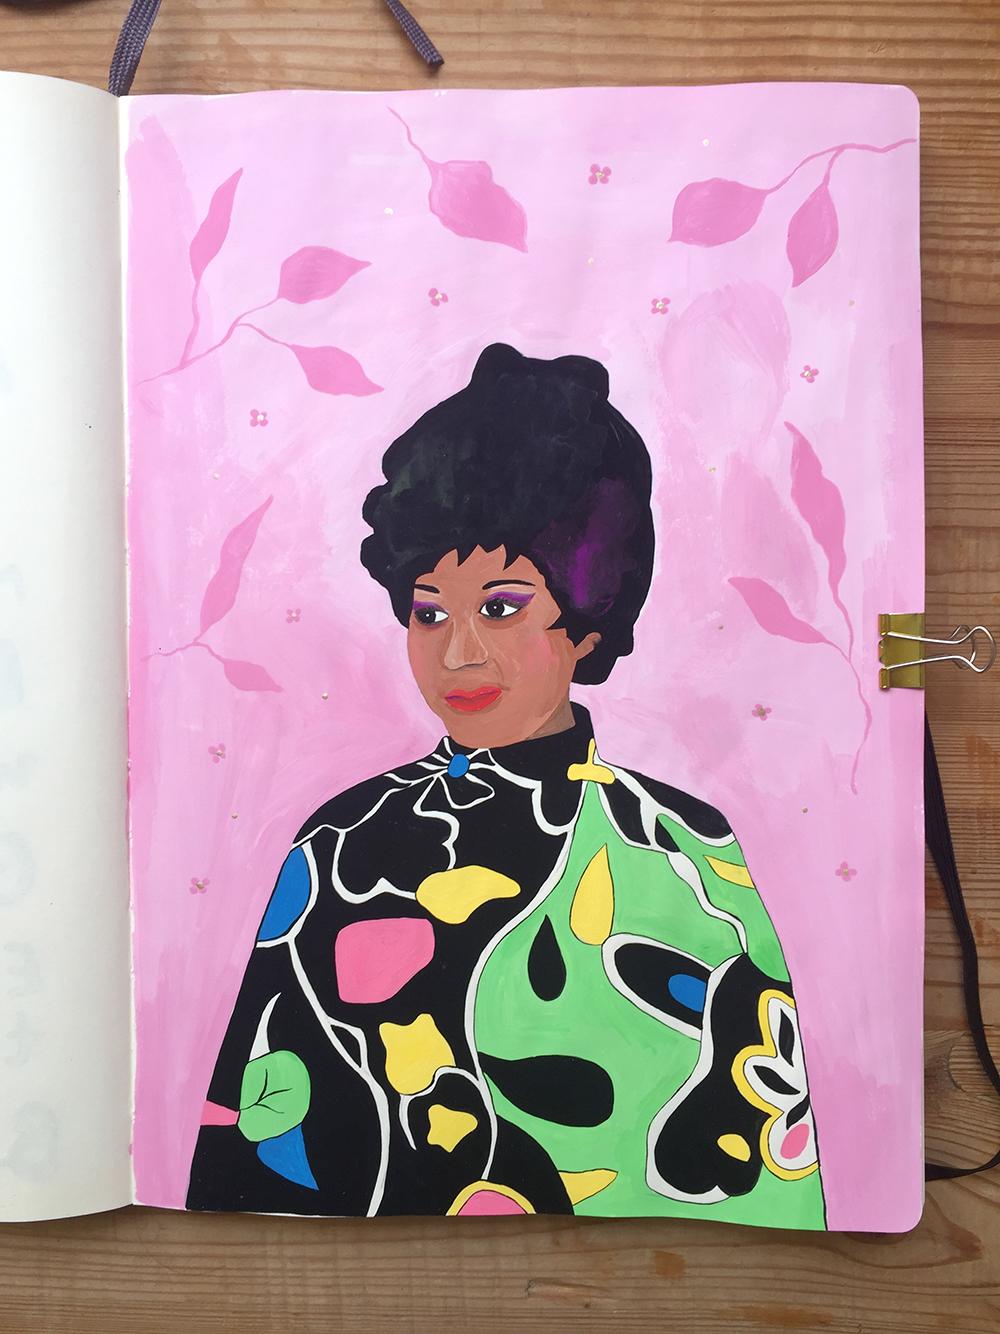 Aretha Franklin by Marenthe.jpg